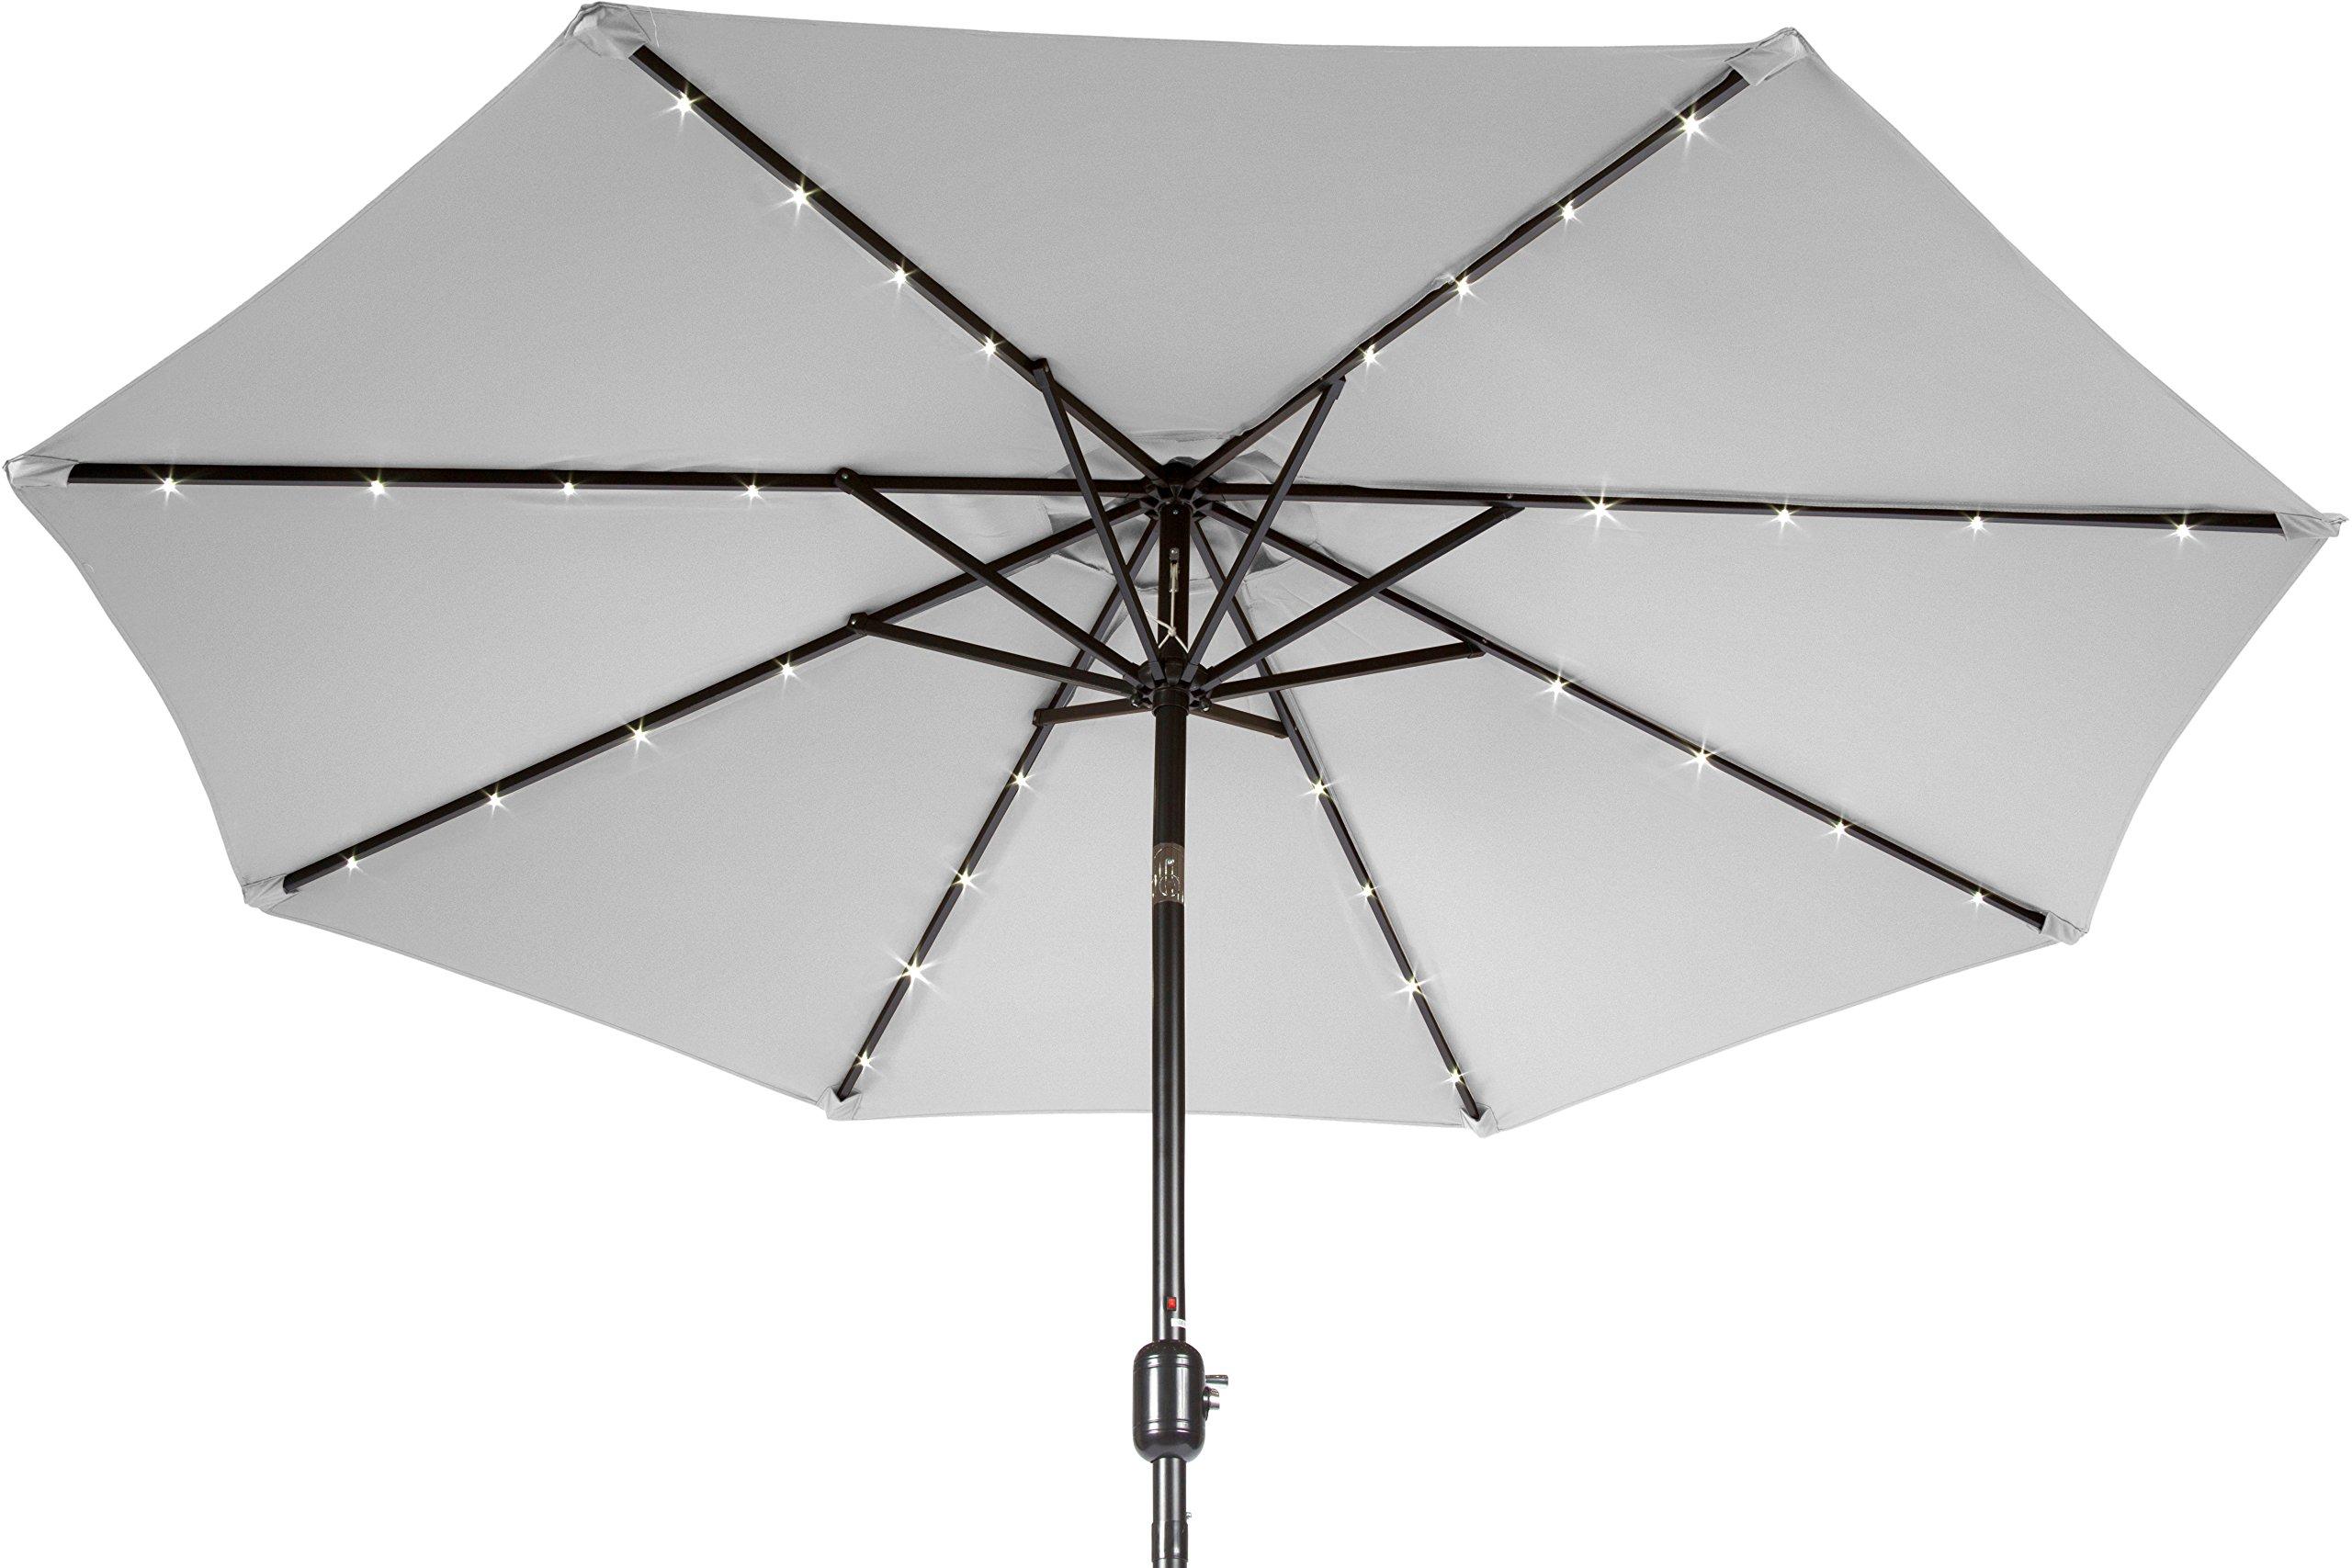 Trademark Innovations 7' Solar LED Patio Umbrella (Gray) - 7' diameter, crank operation, with tilt option 8 Steel ribs, each rib has 3 LED lights Fabric 180G Polyester with Black Steel Coating - shades-parasols, patio-furniture, patio - 813ltA H76L -